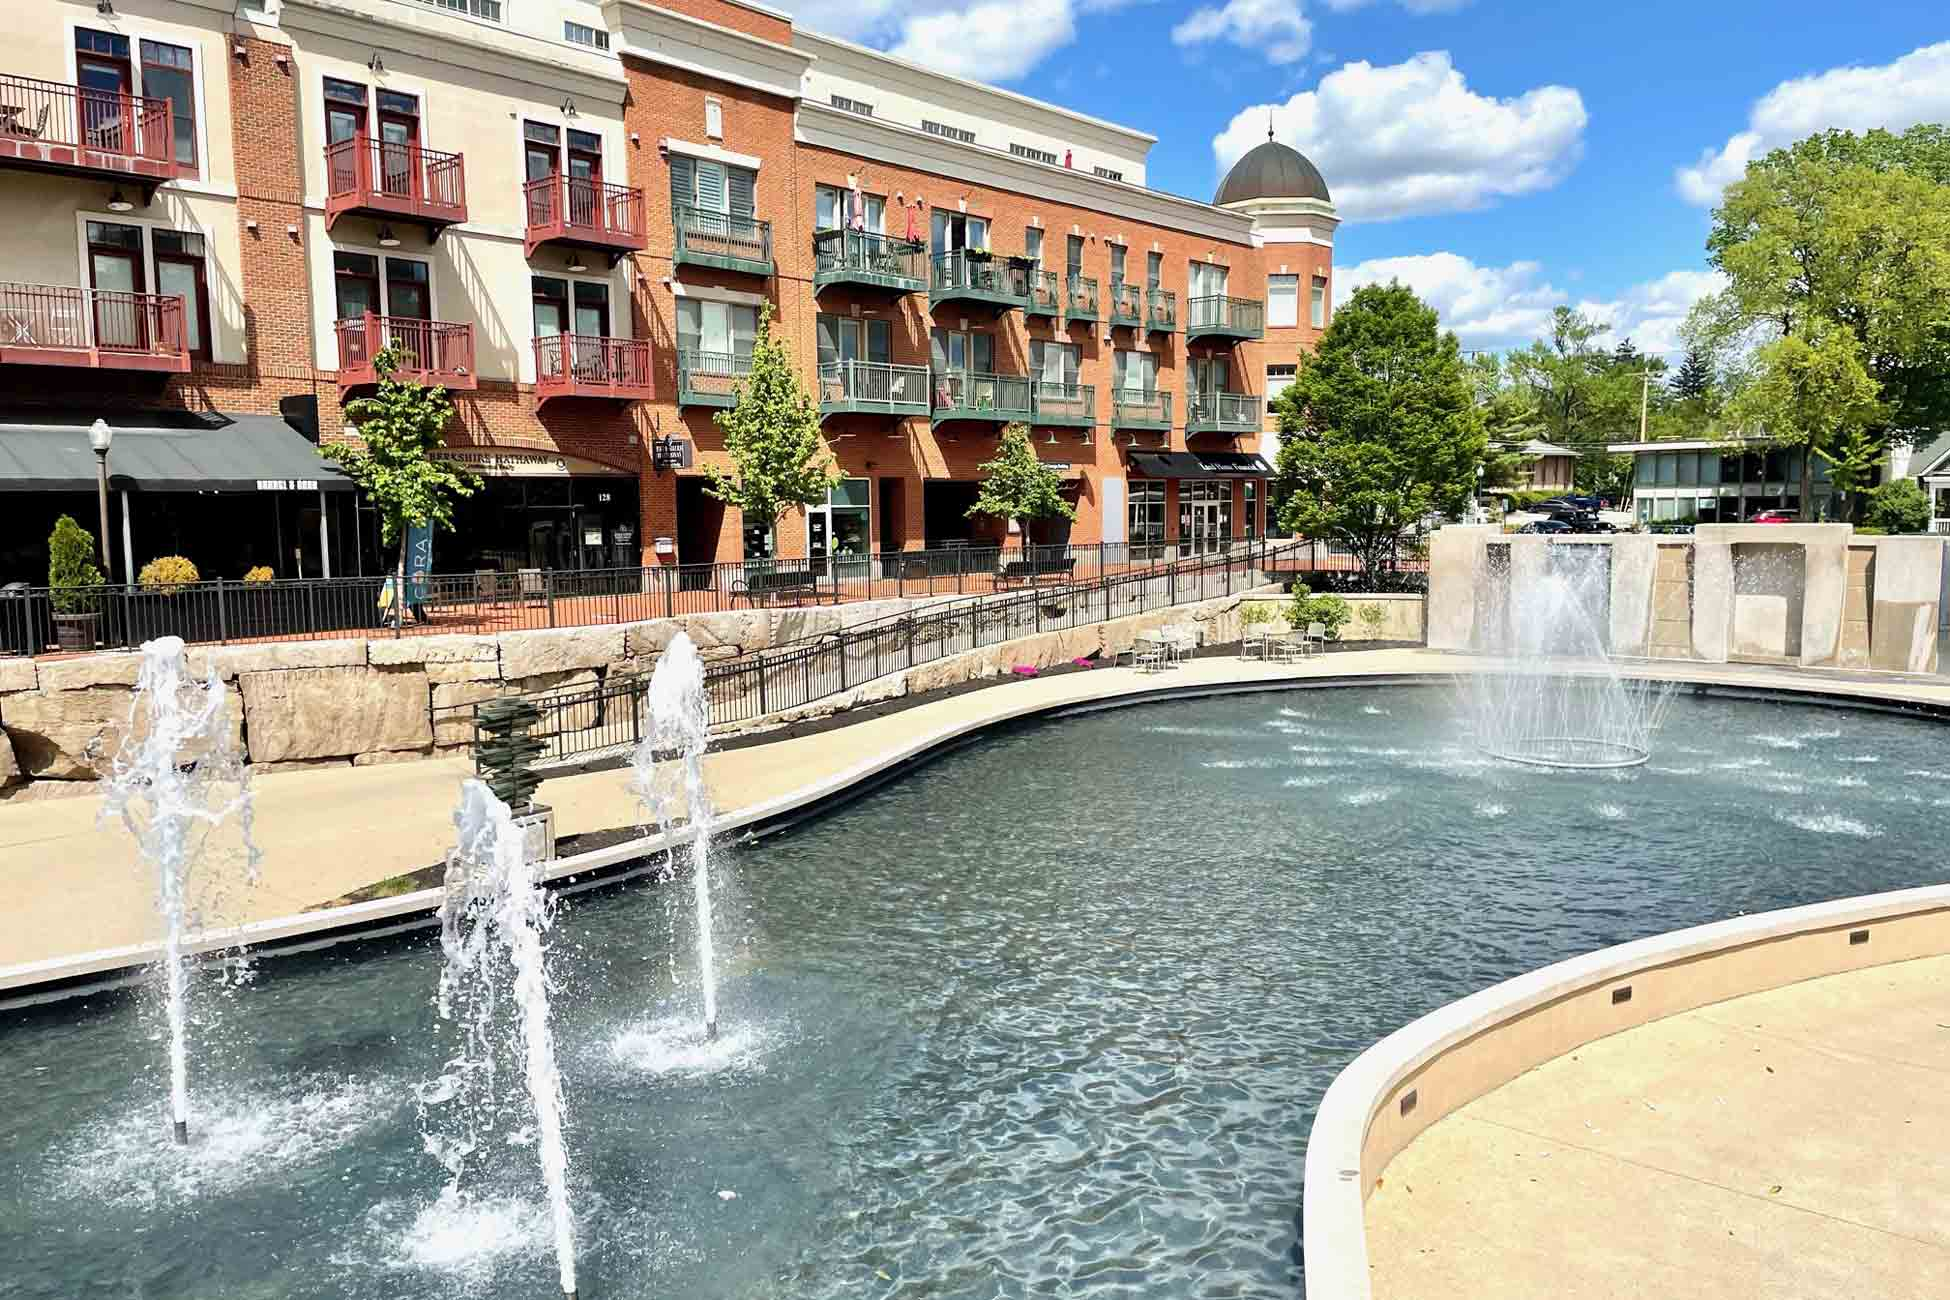 Creekside Gahanna fountain